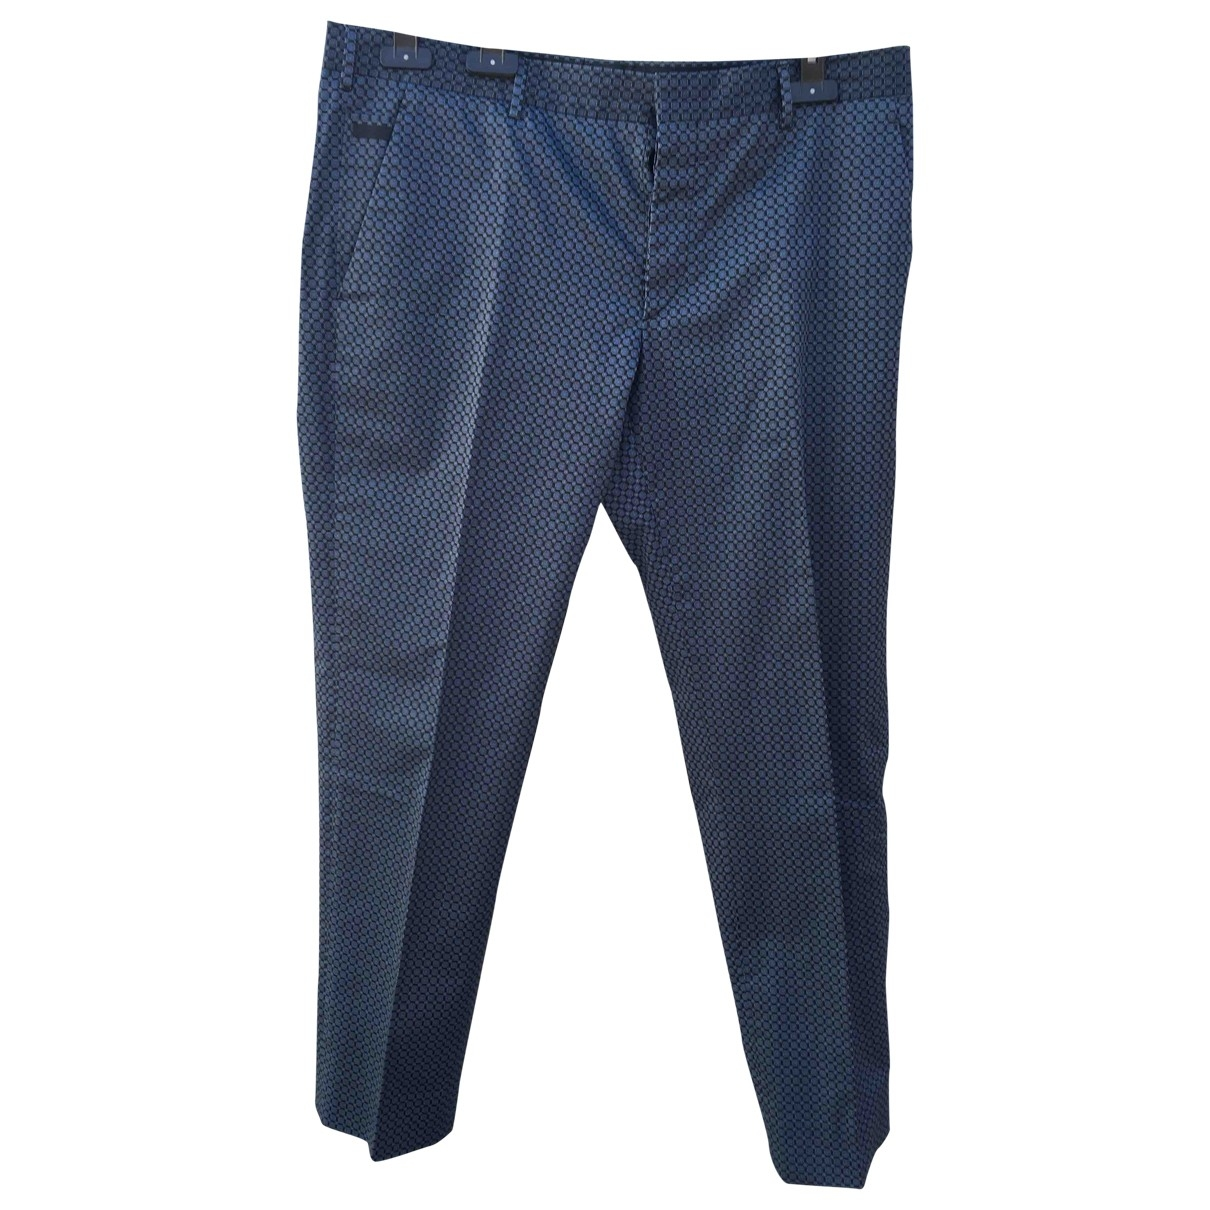 Prada \N Blue Cotton Trousers for Men 52 IT